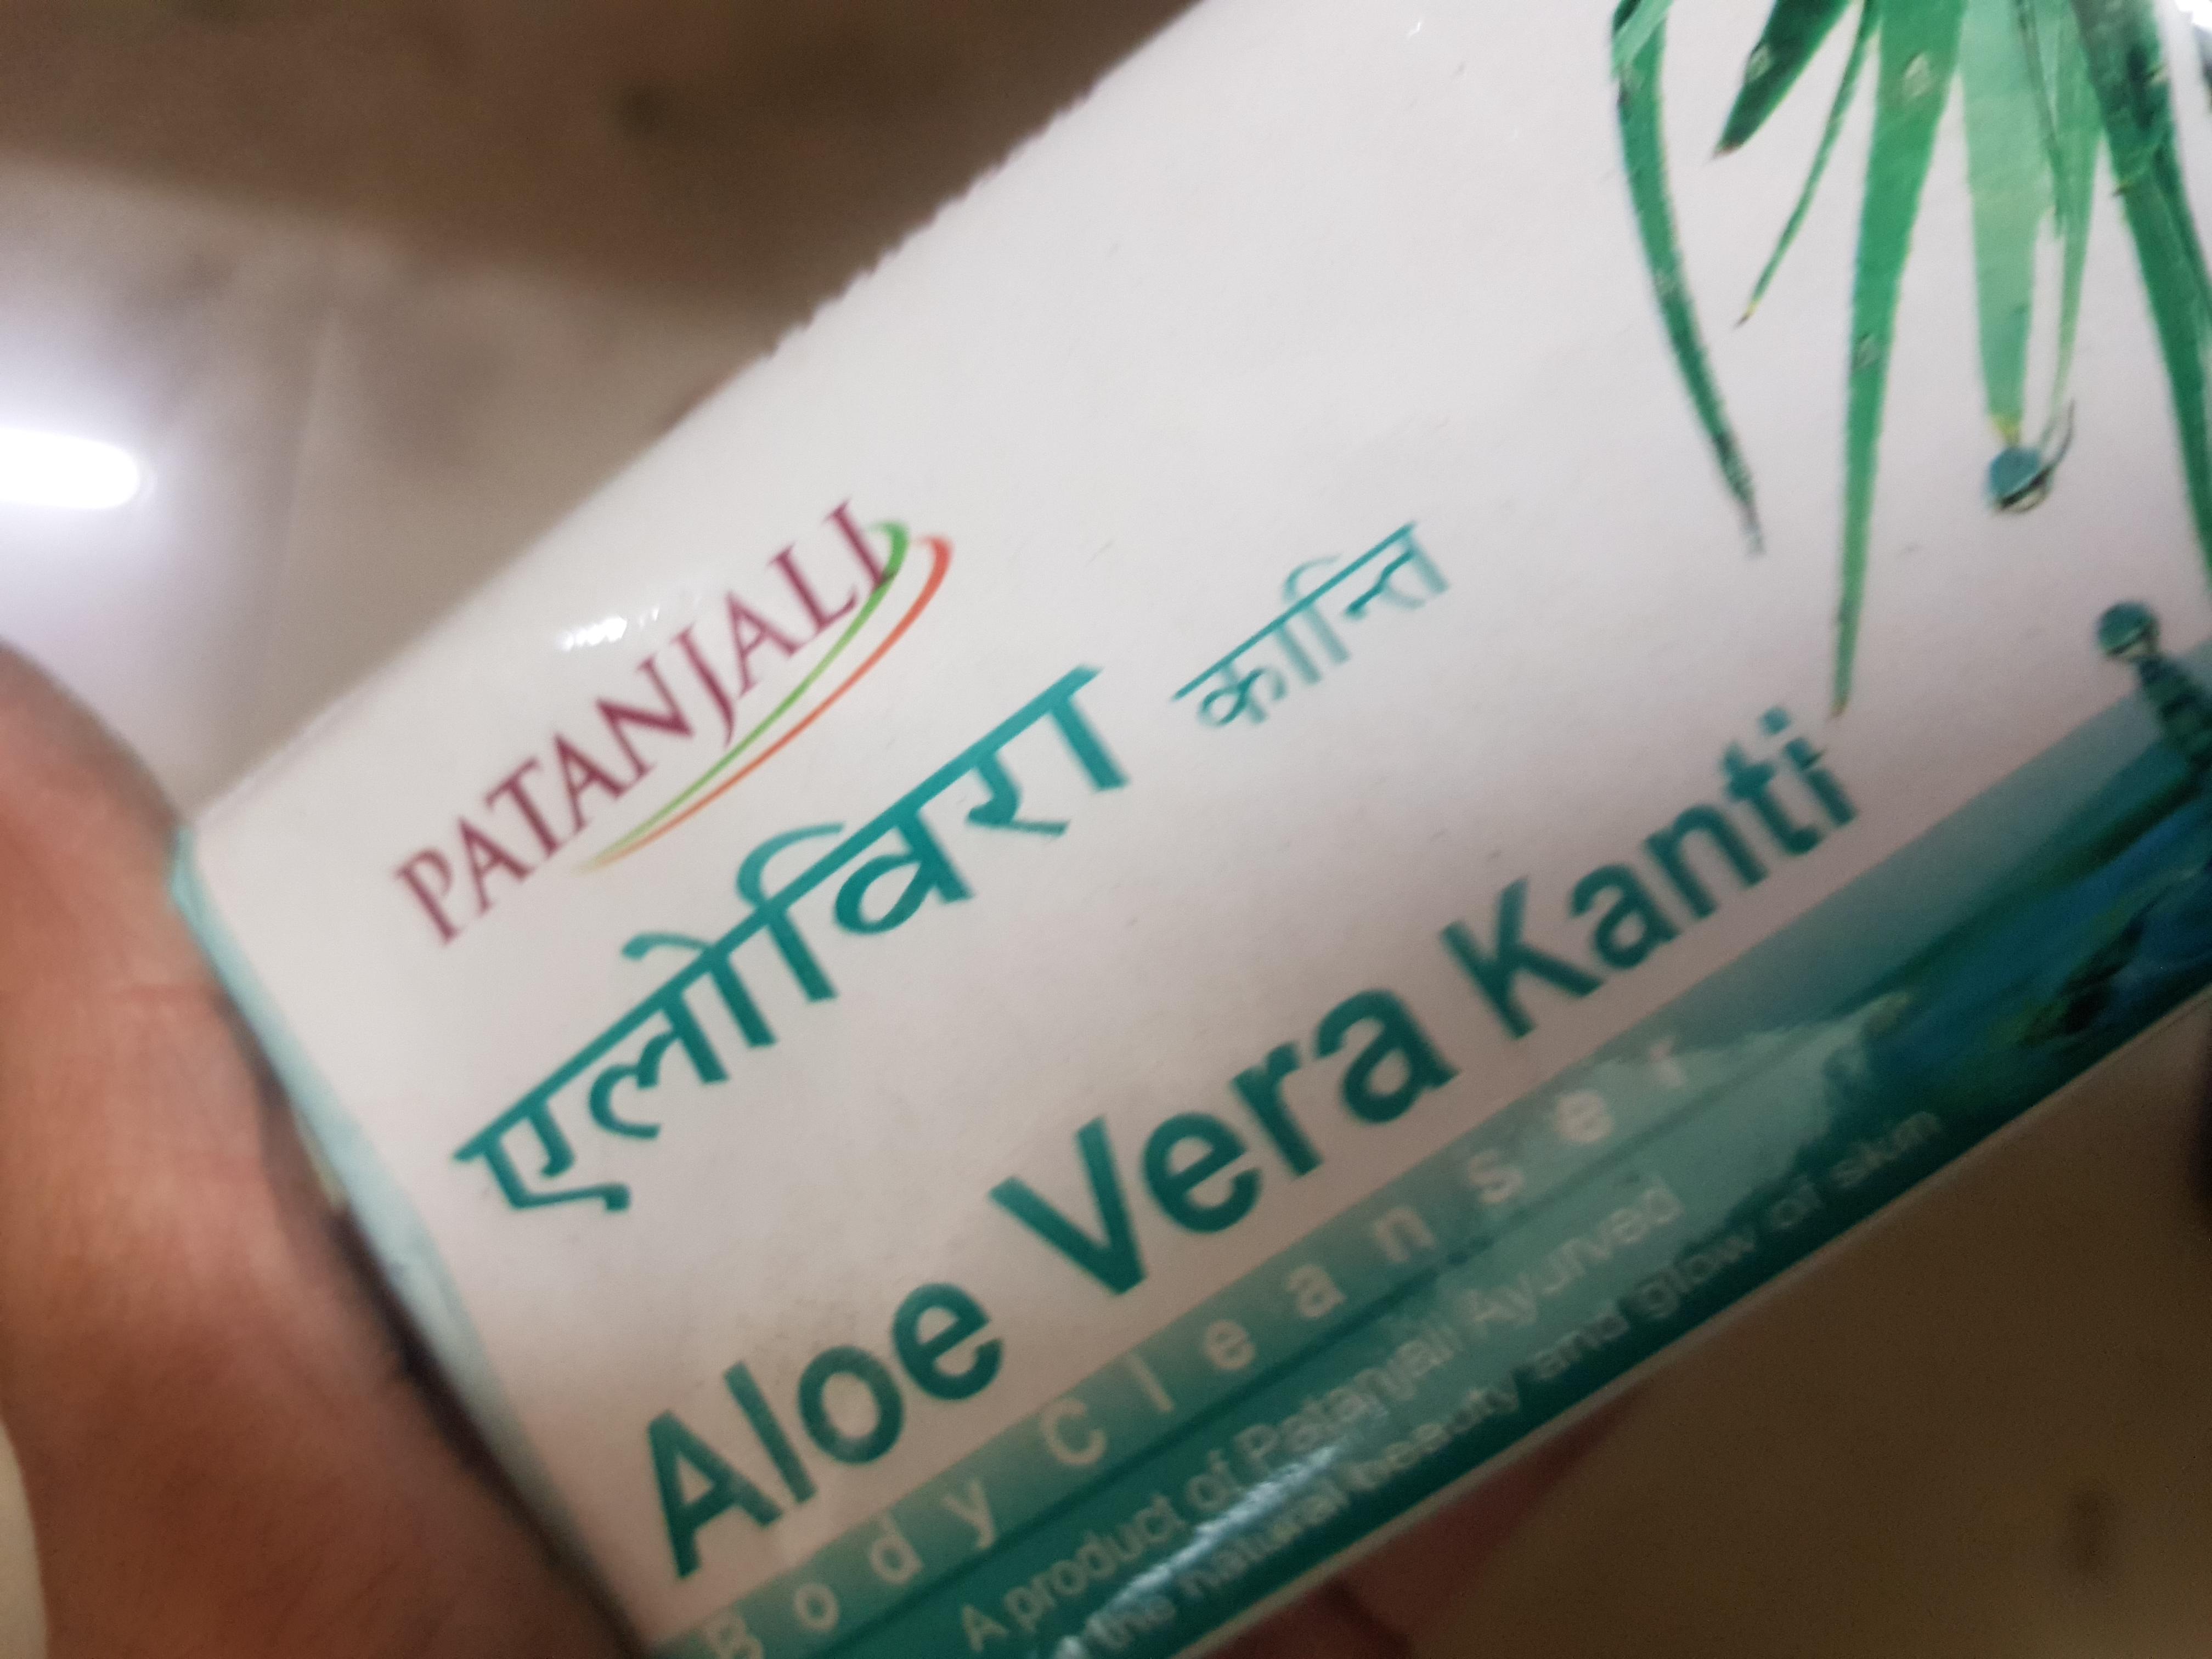 Patanjali Aloevera Kanti Body Cleanser-Aloe Vera!-By poonam_kakkar-2